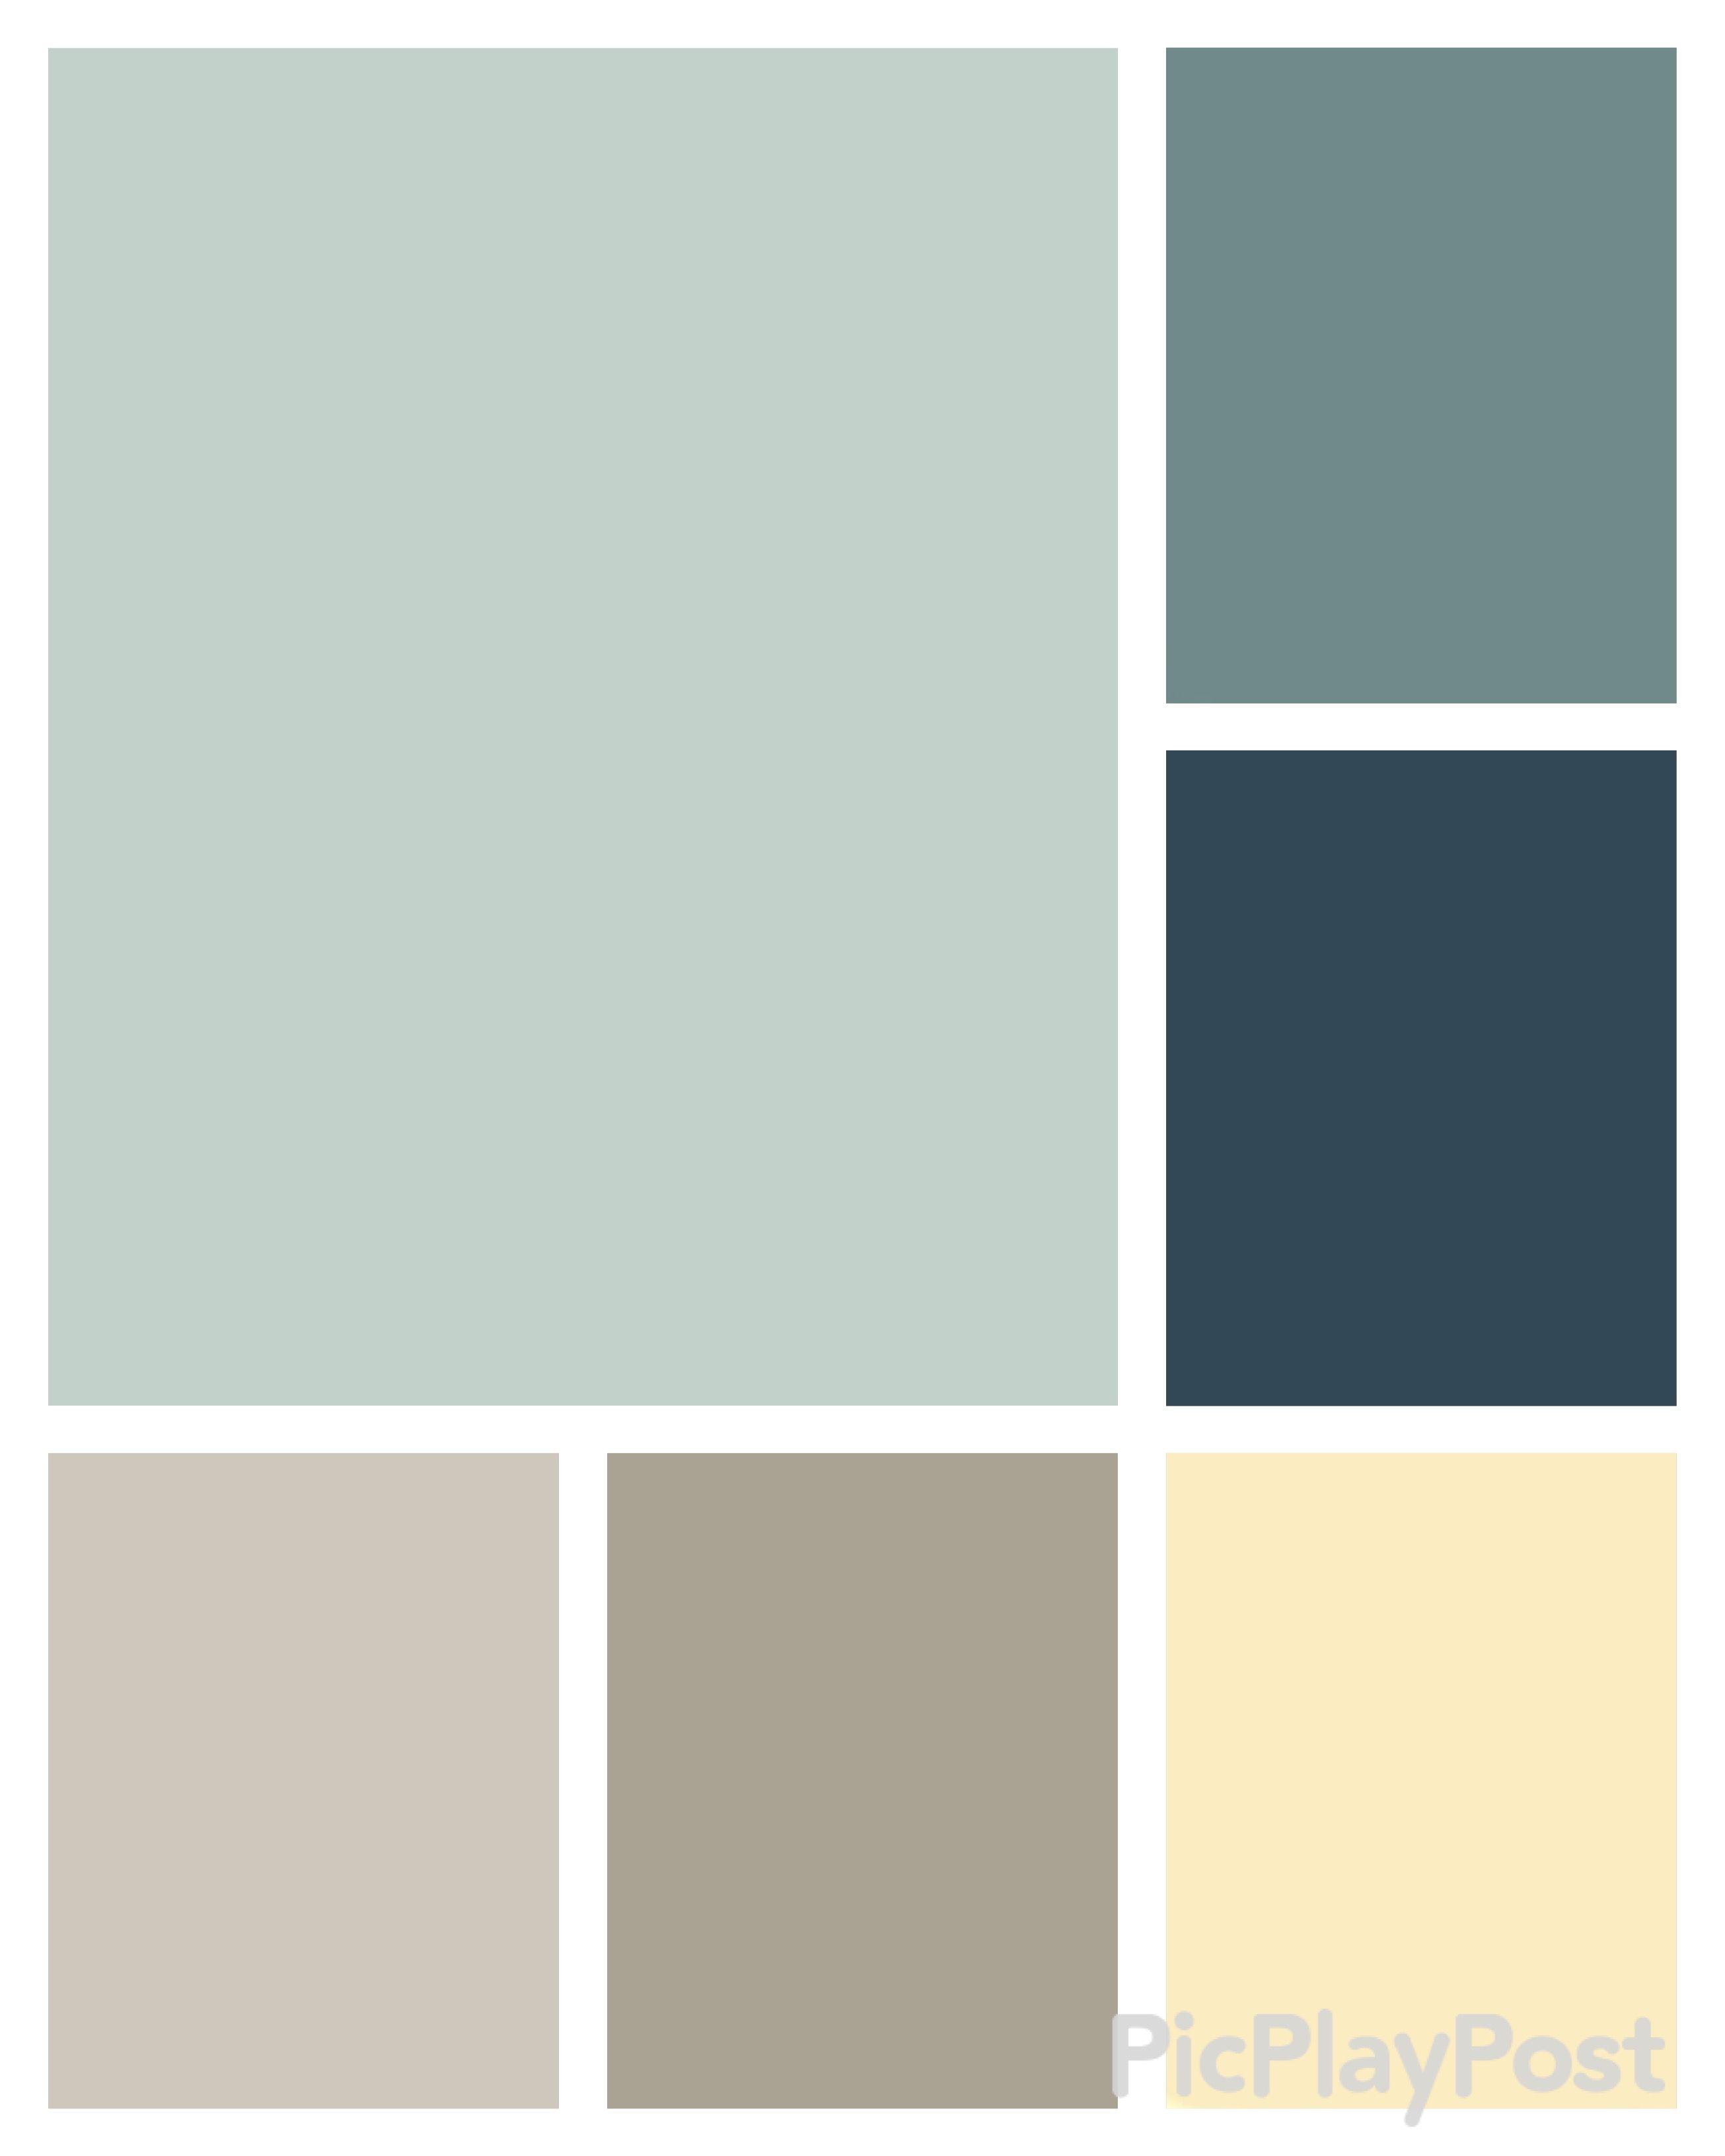 Clockwise Palladian Blue Bm Aegean Teal Bm Gentleman S Gray Bm Old World Romance Blue Paint Living Room Blue Living Room Decor Paint Colors For Home